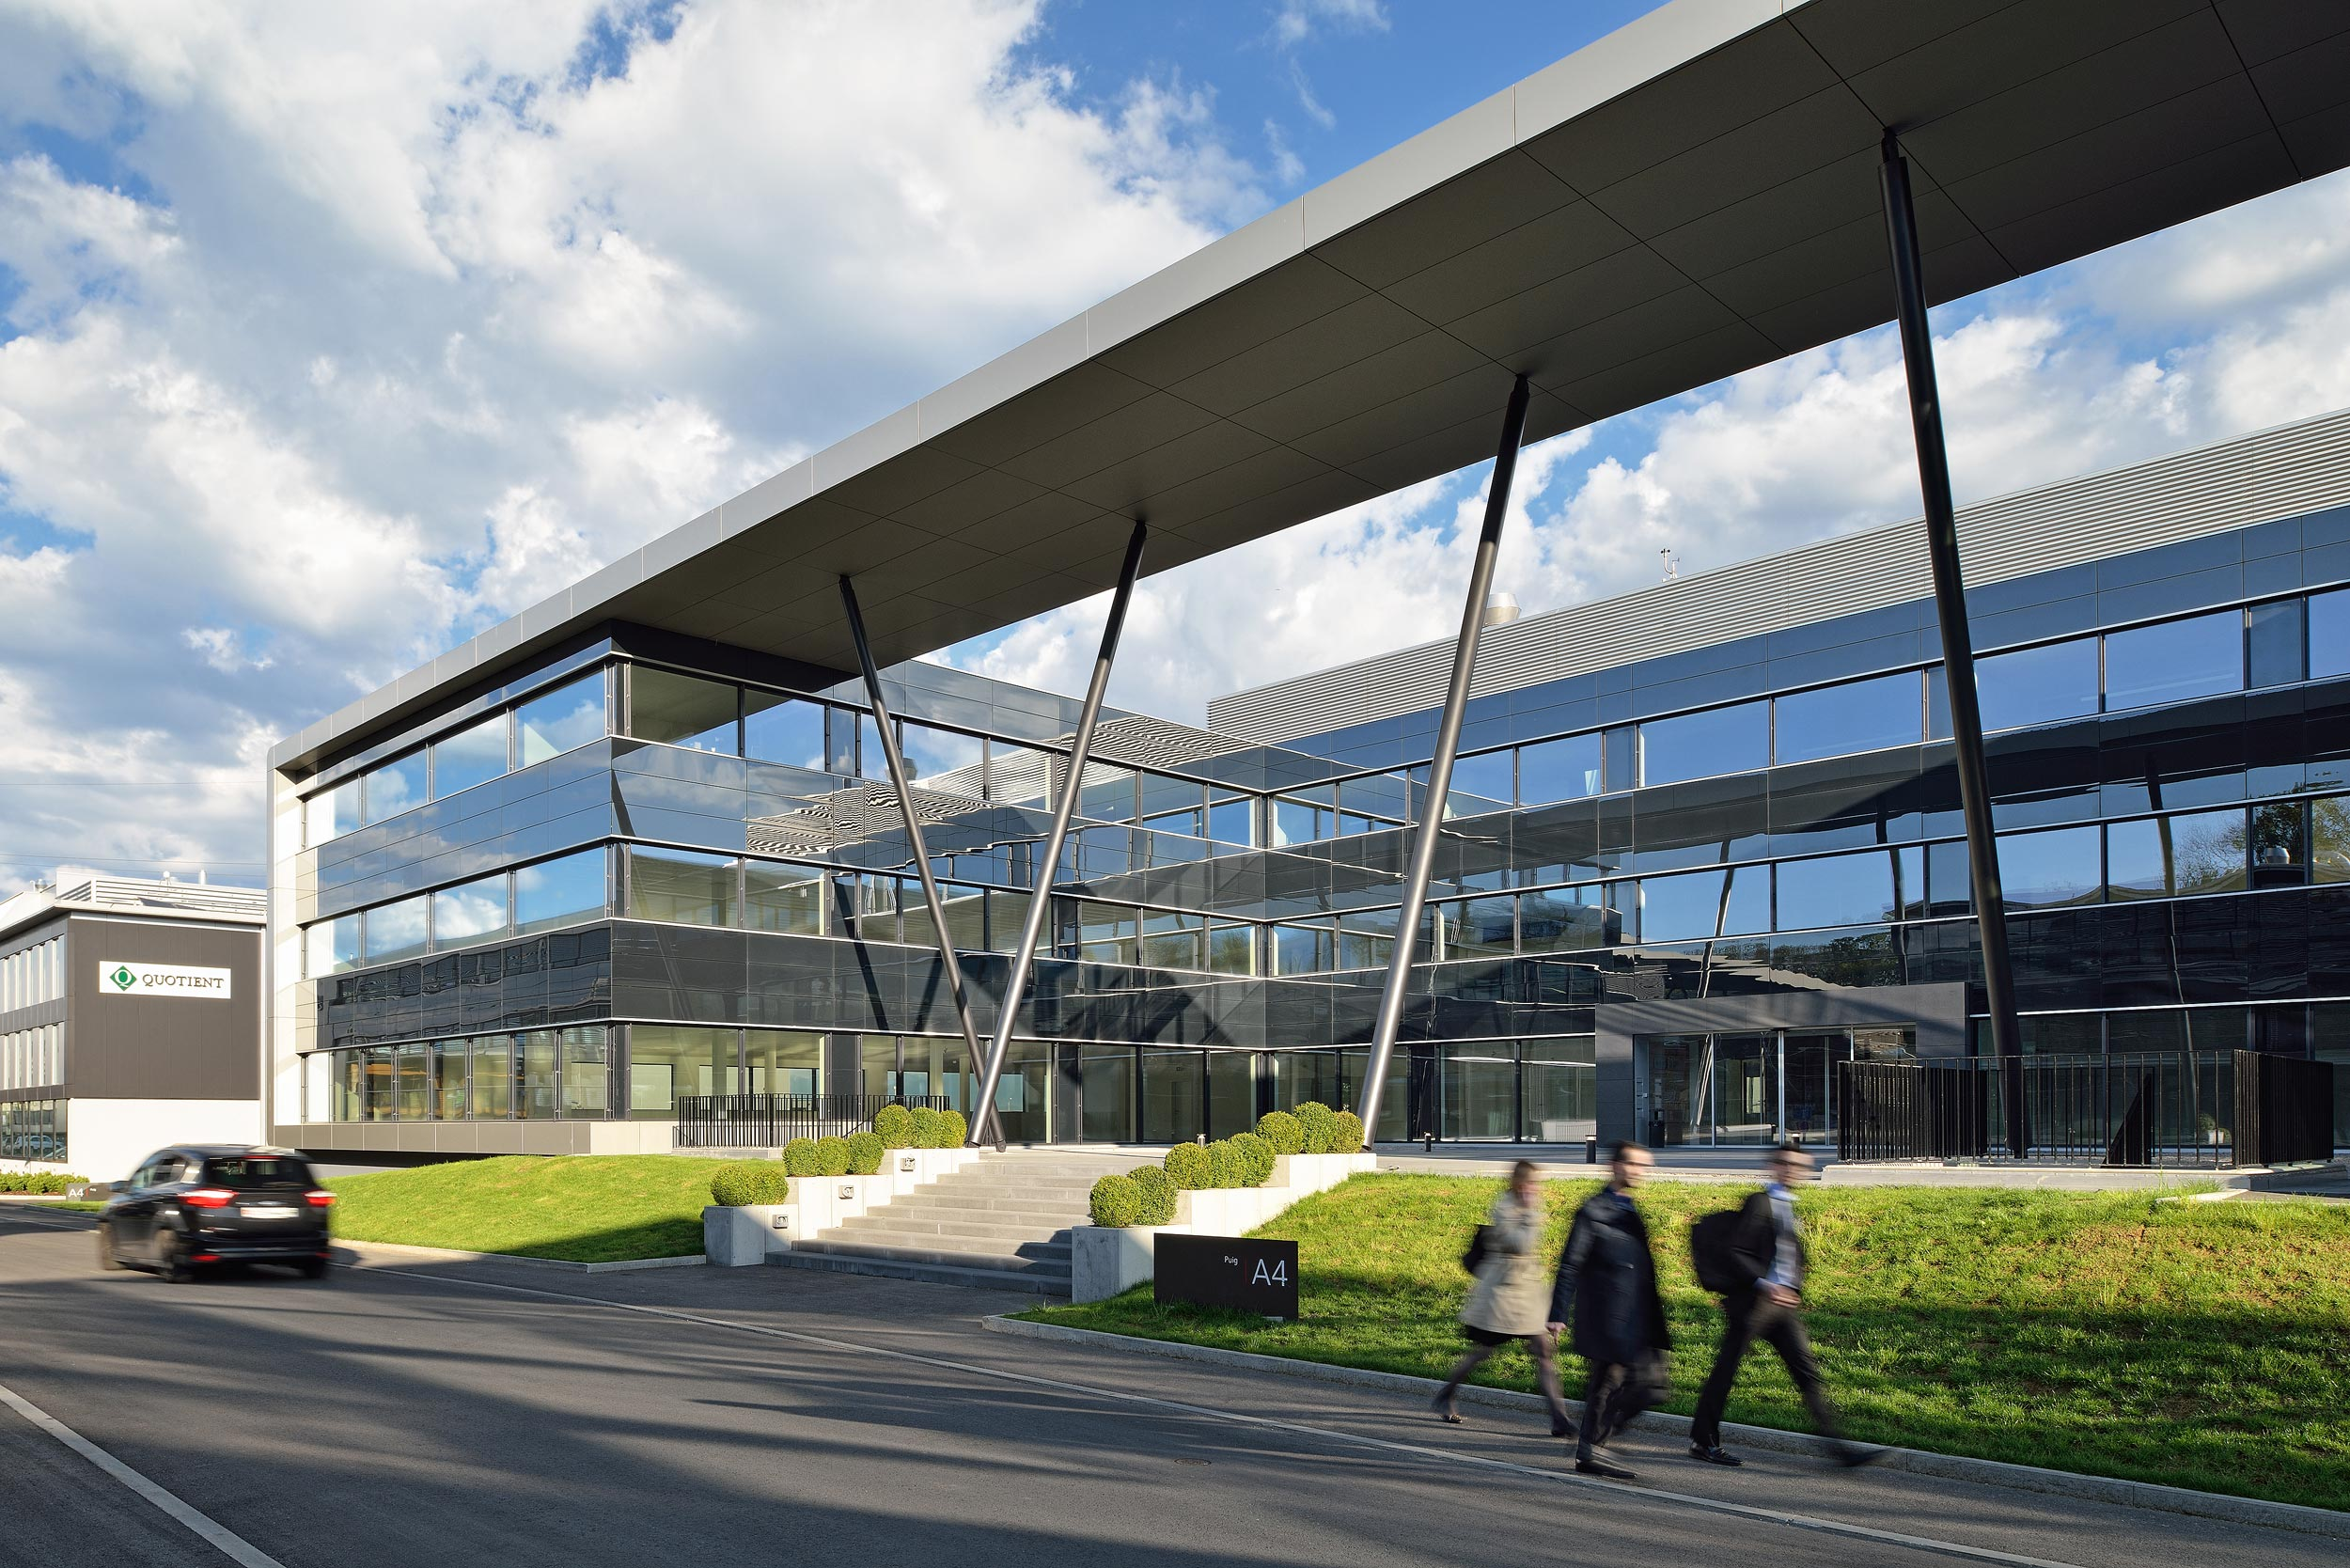 Terre Bonne Park in Zwitserland - architectuurfotograaf Chiel de Nooyer